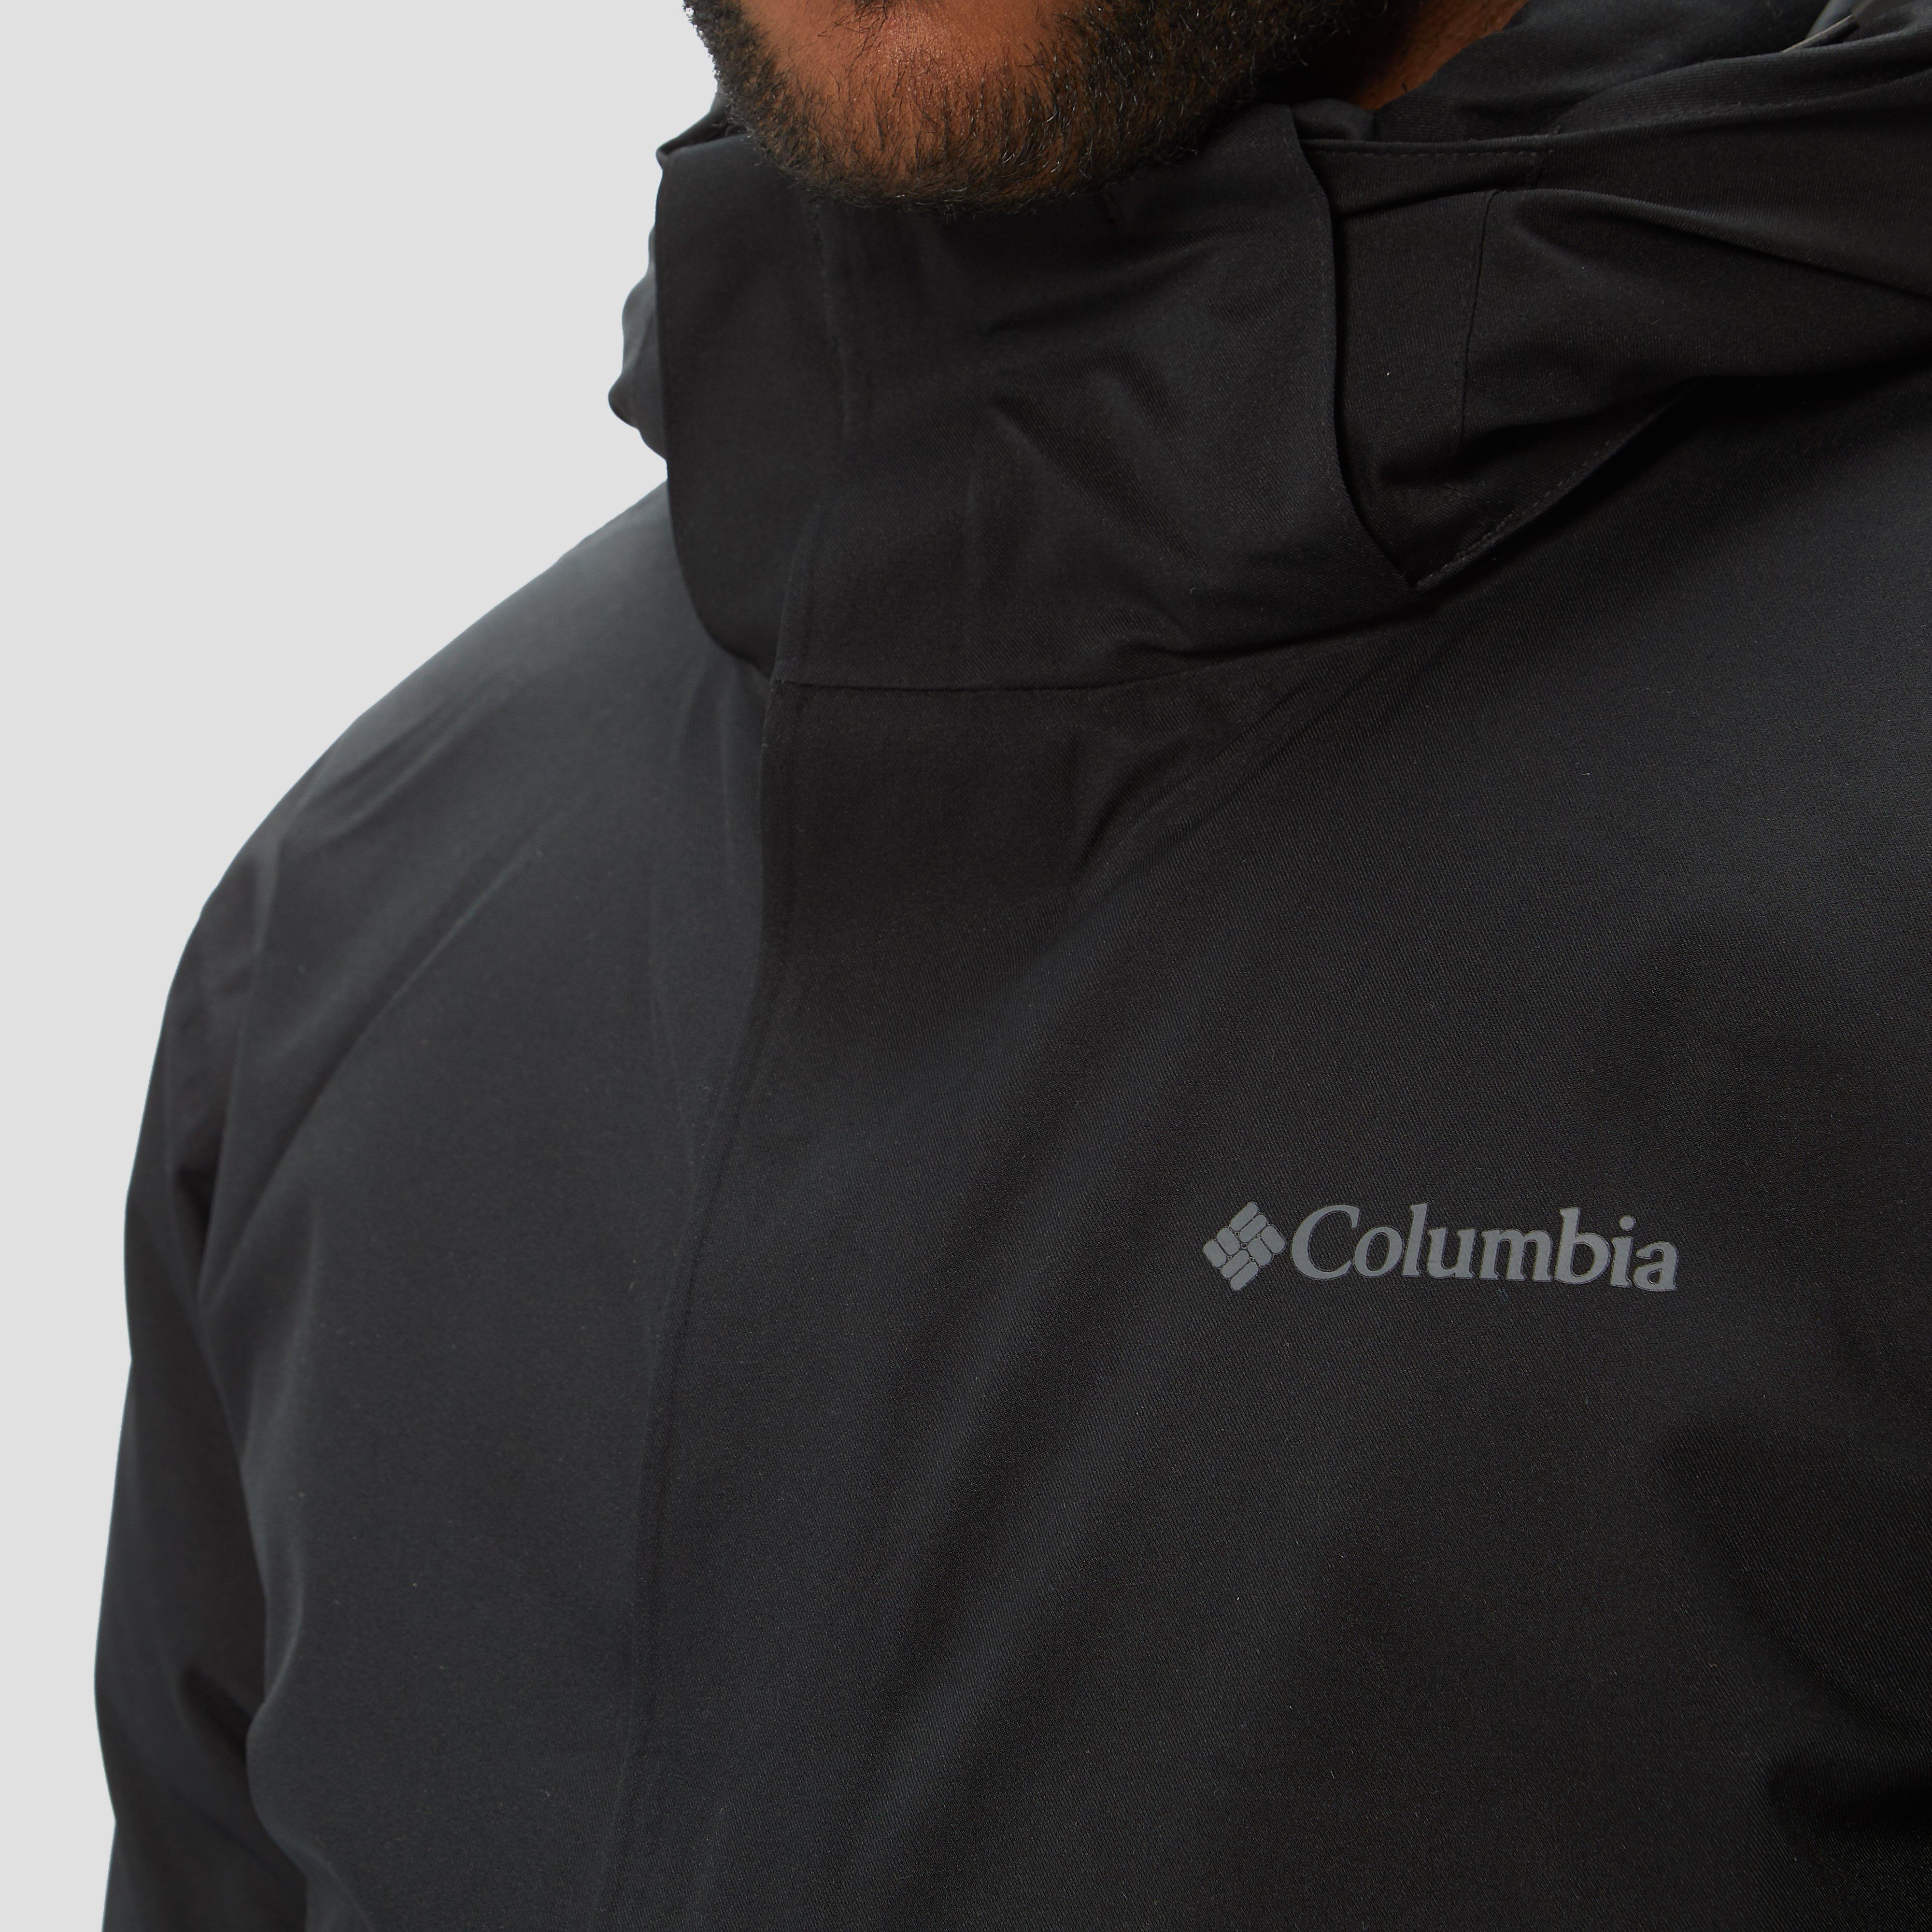 COLUMBIA BLIZZARD JAS